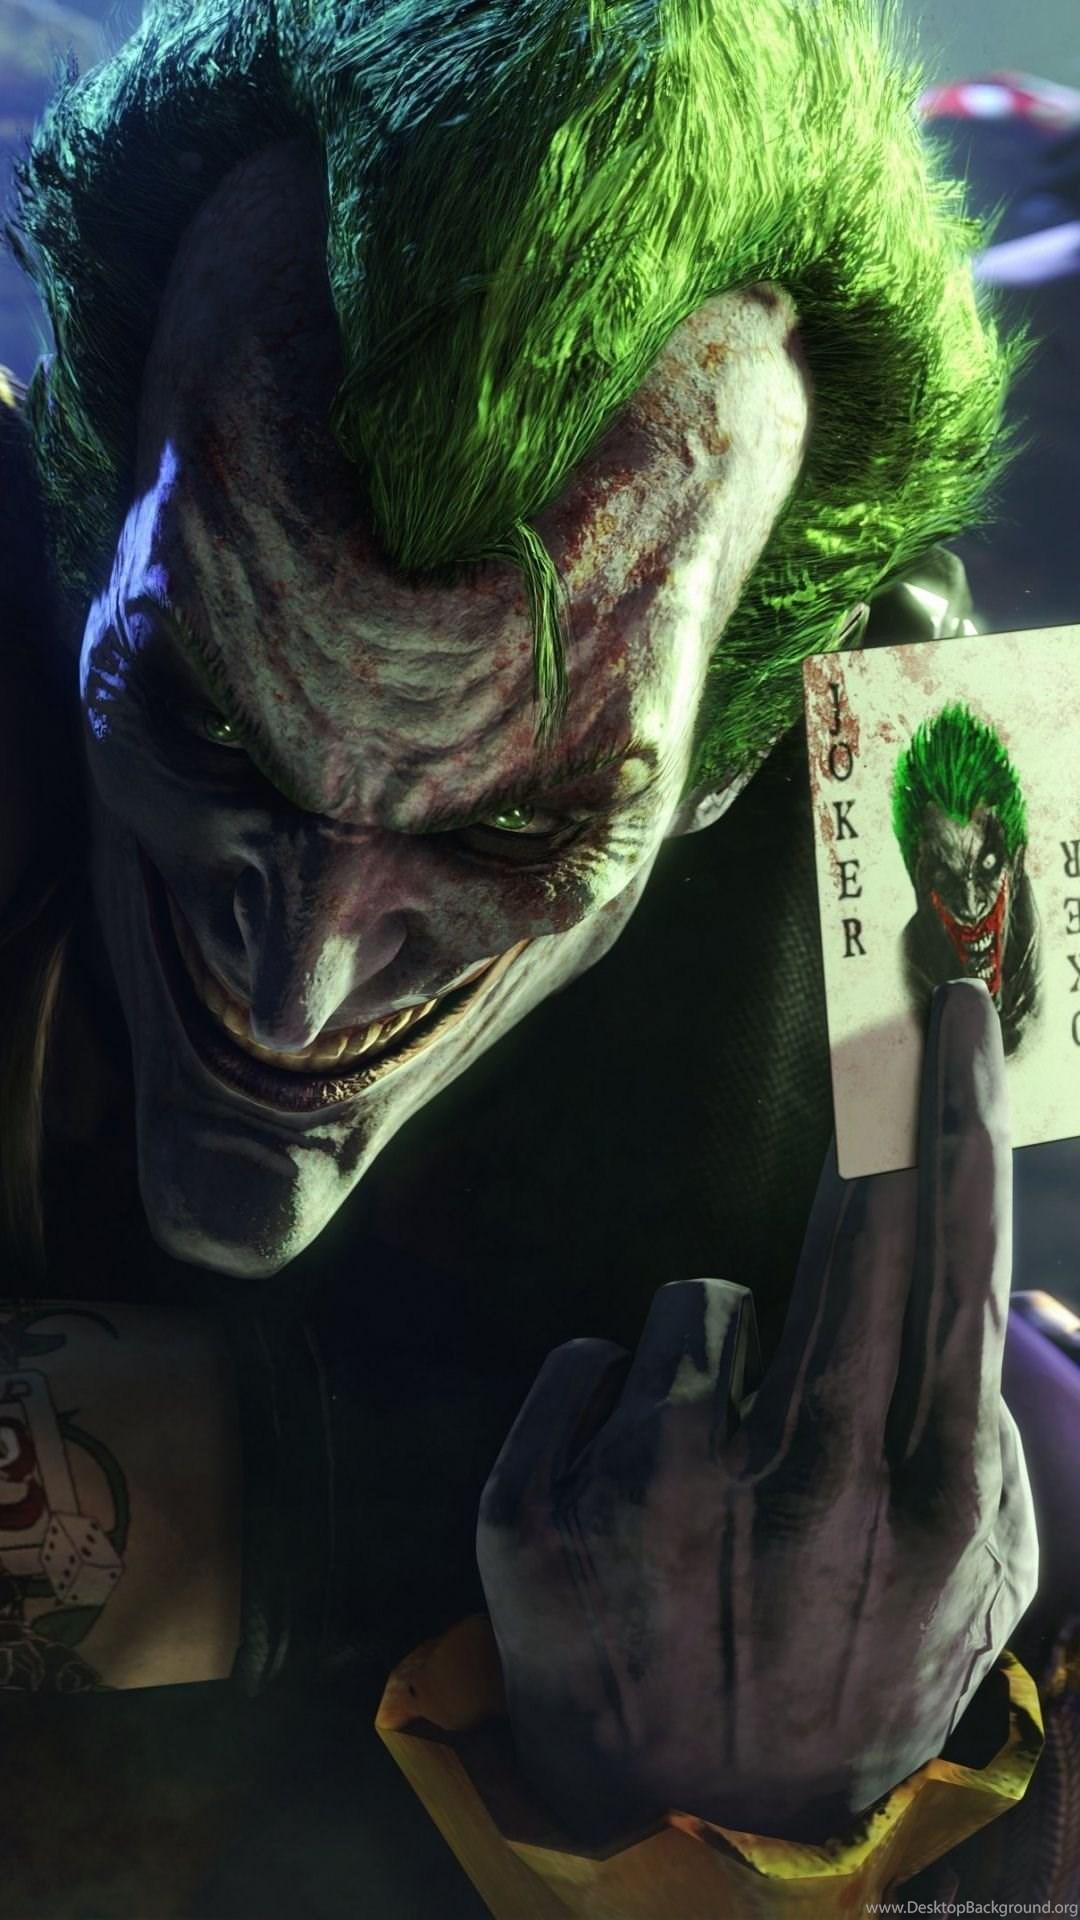 Iphone 6s Plus Comics Joker And Harley Quinn Wallpapers Id